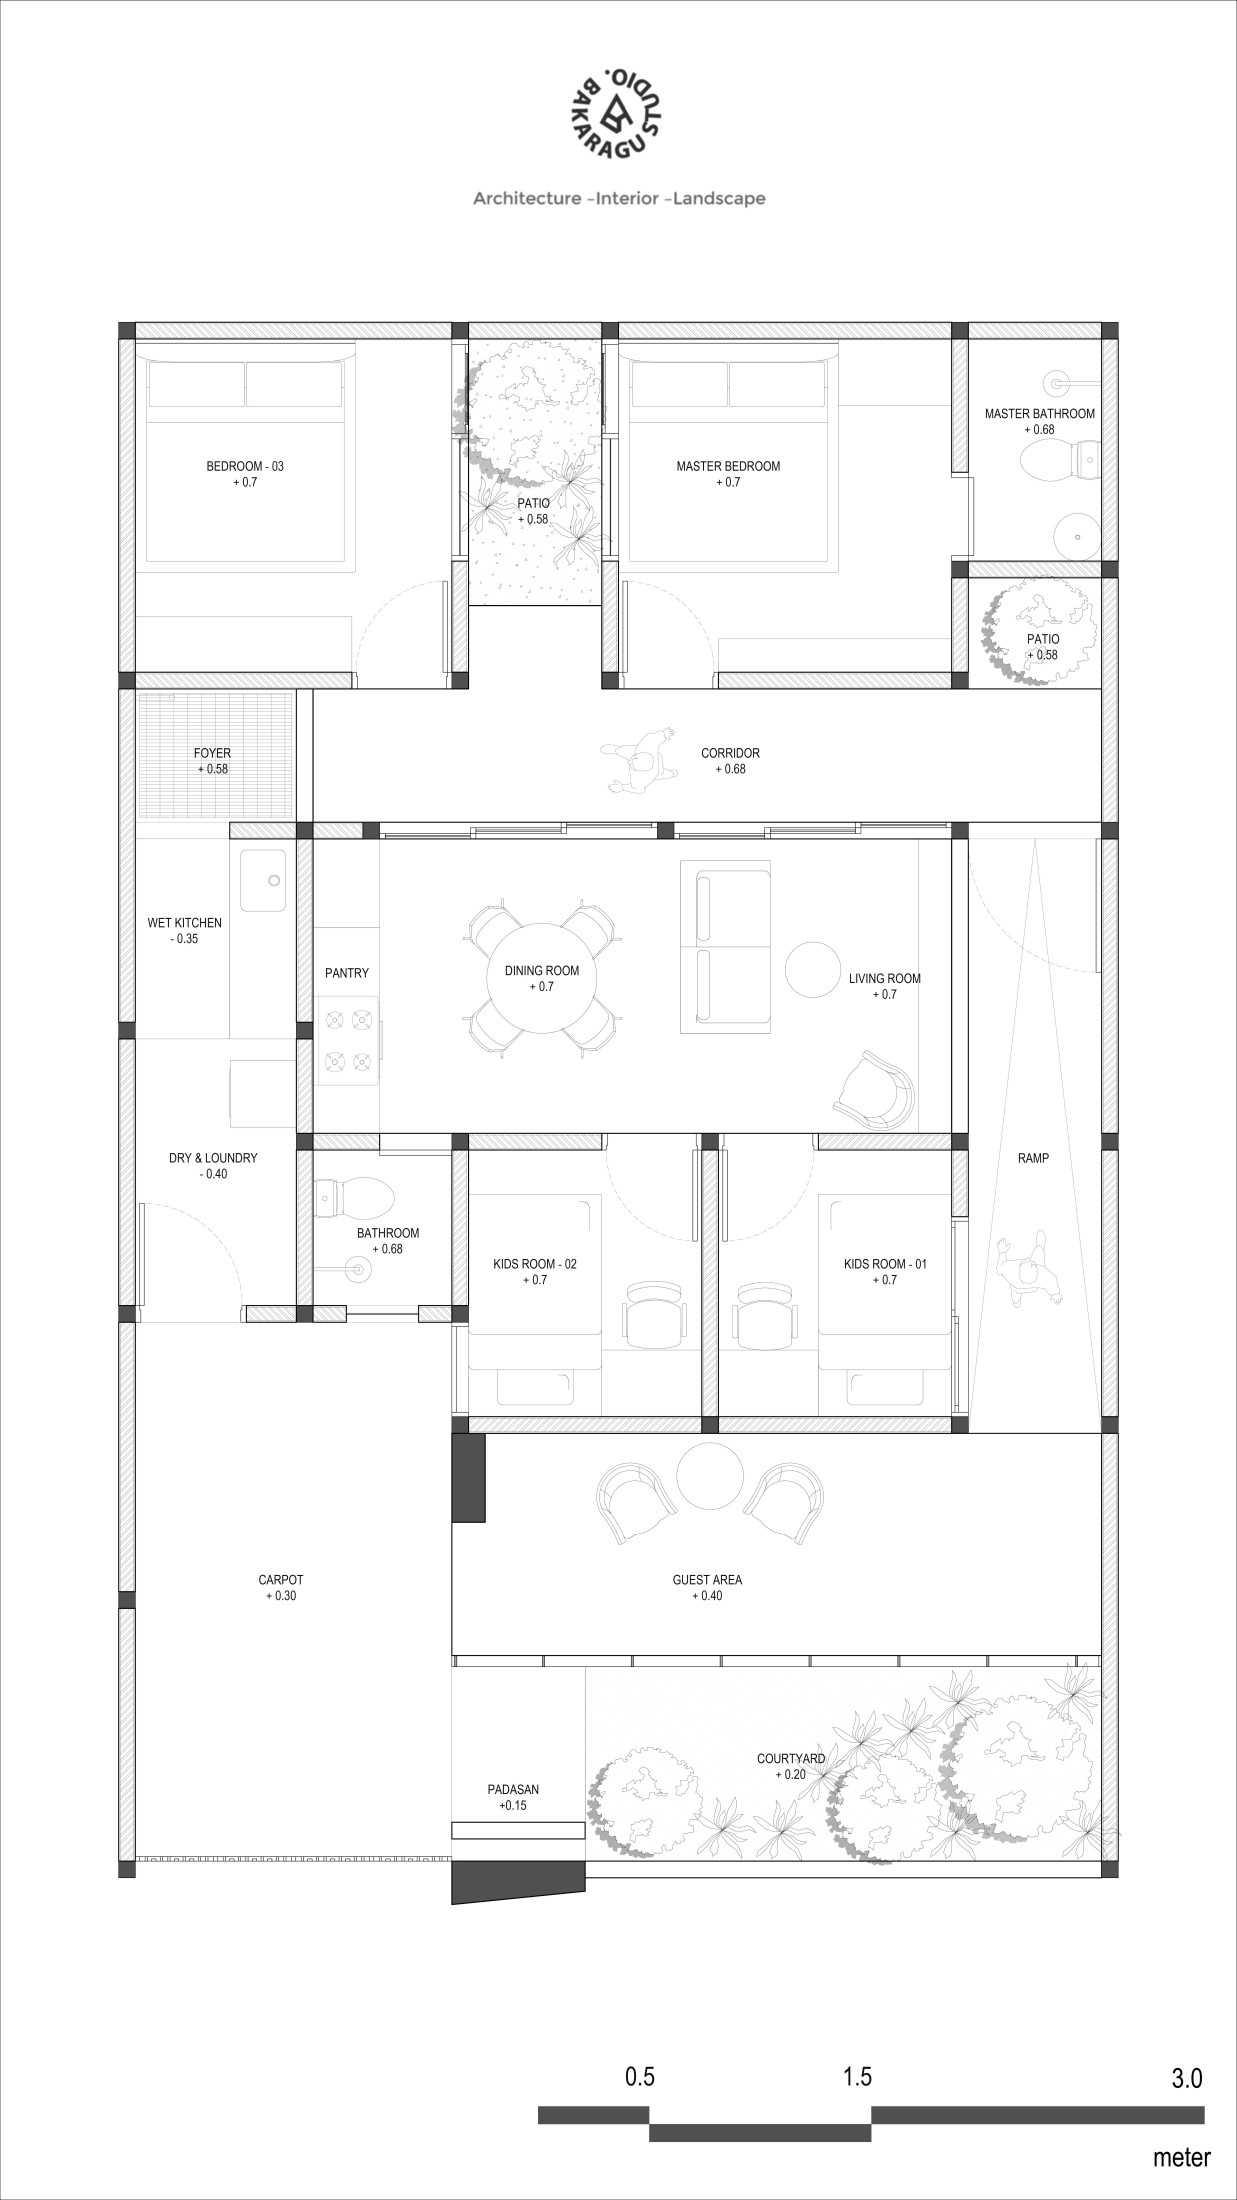 Bakaragu.id Ghina House Madiun, Kota Madiun, Jawa Timur, Indonesia Madiun, Kota Madiun, Jawa Timur, Indonesia Bakaraguid-Ghina-House  106303